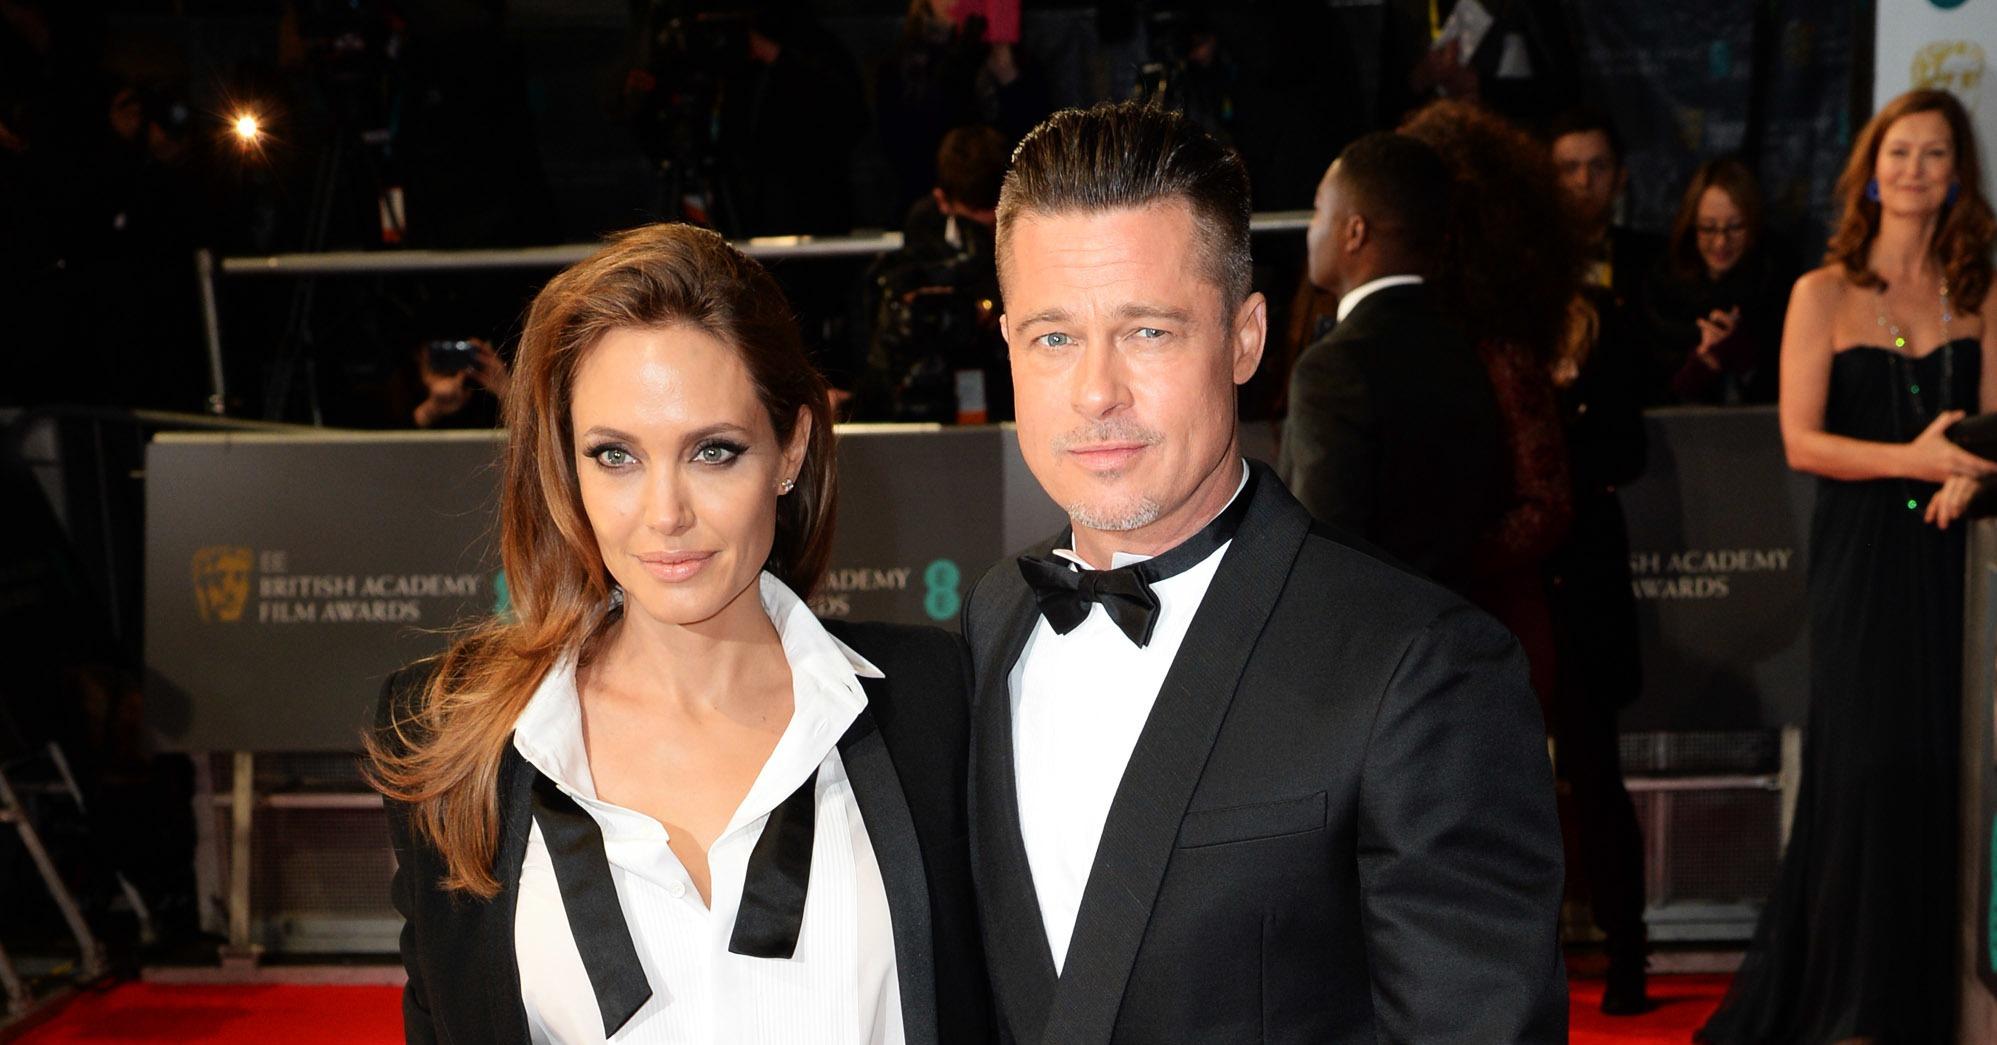 Angelina-Jolie-Brad-Pitt-2014-BAFTA-Red-Carpet